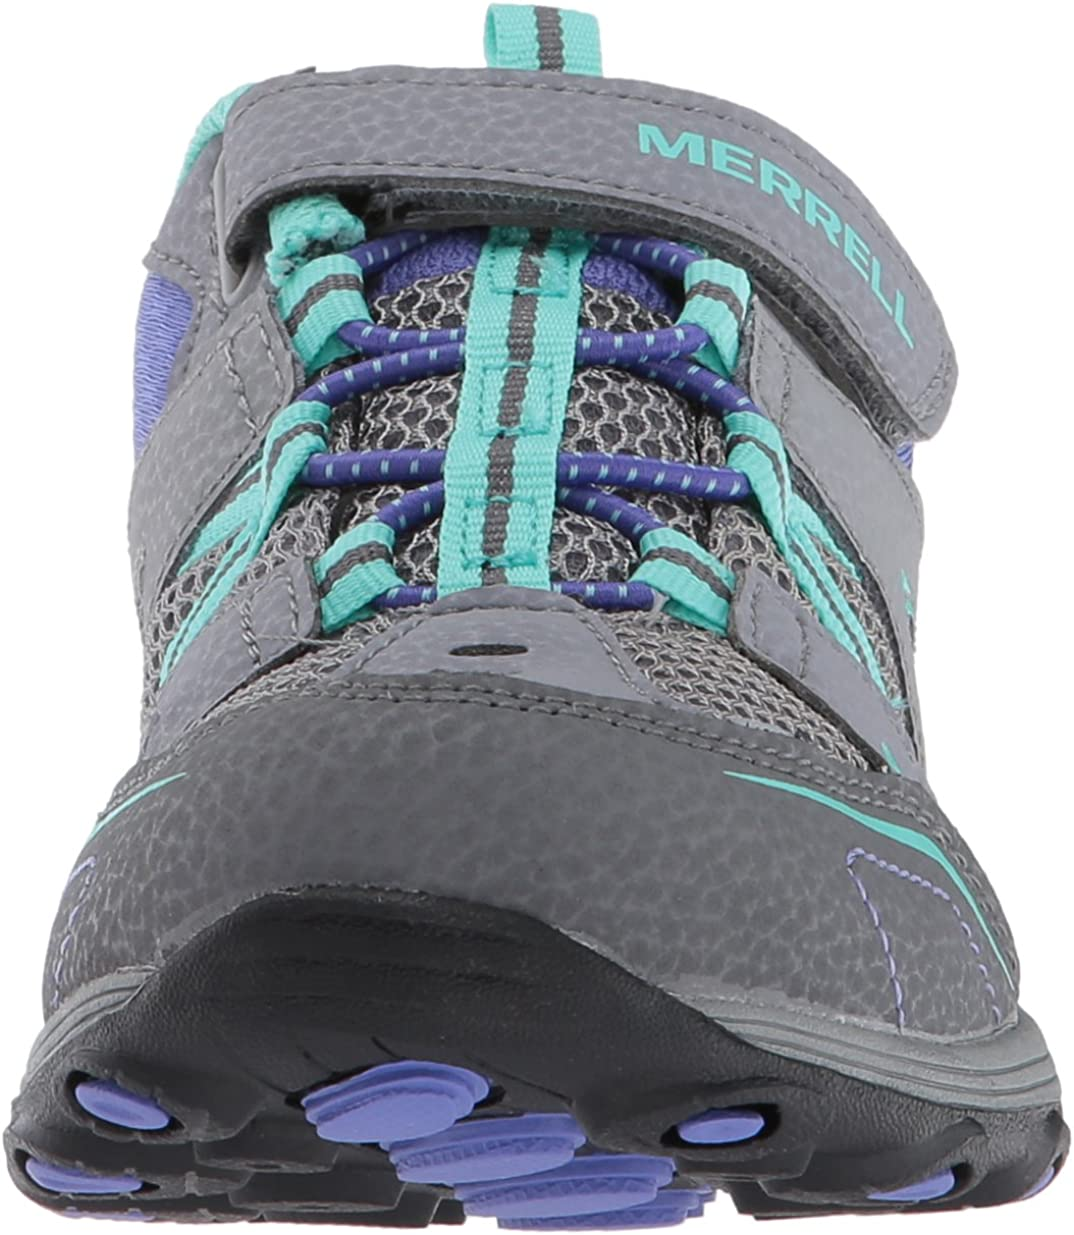 Merrell Mi Trail Chaser Zapatos de Low Rise Senderismo Ni/ños